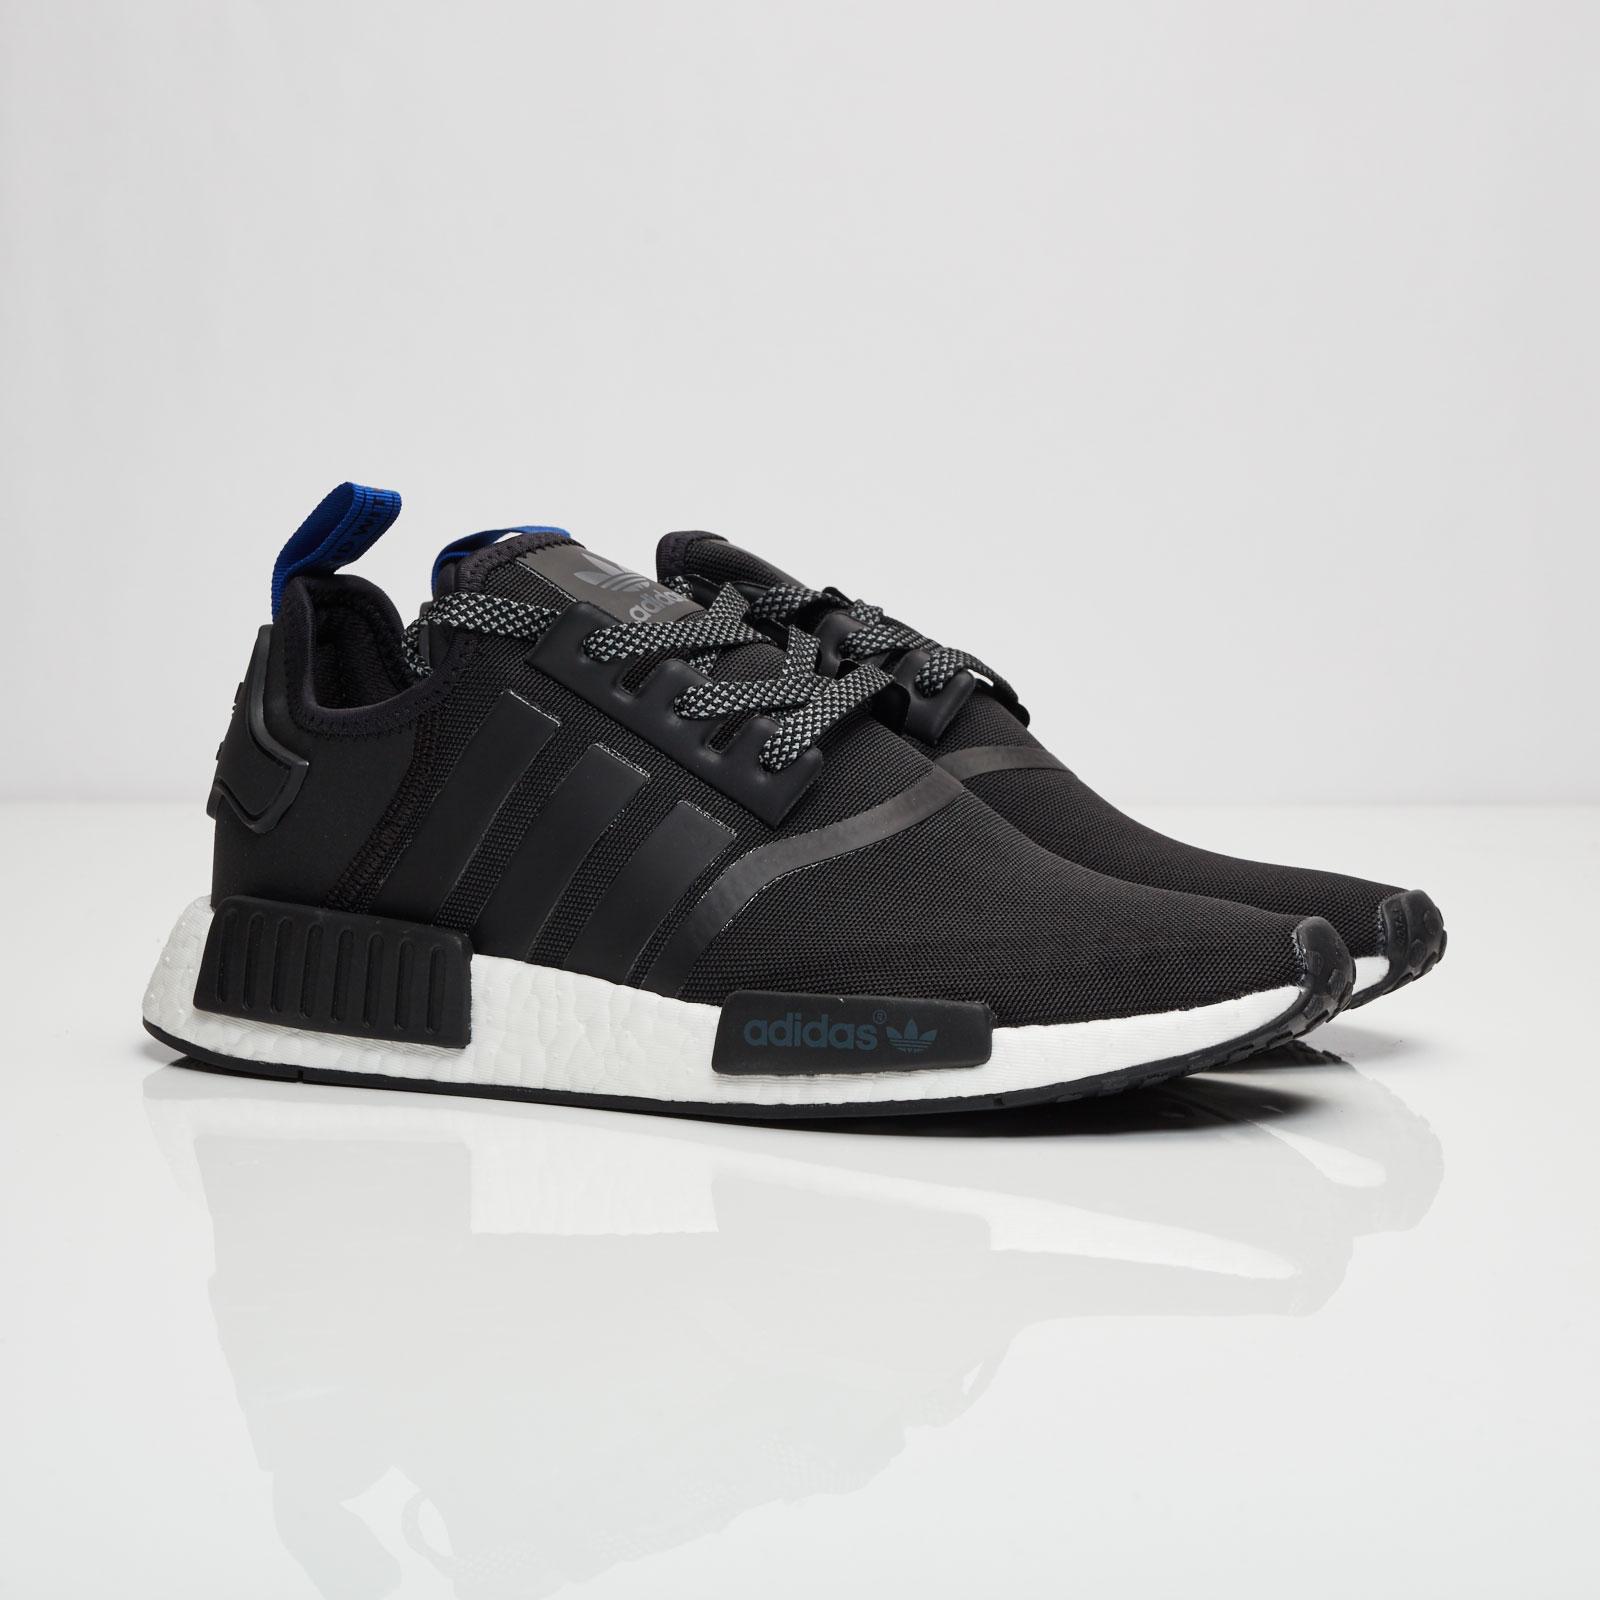 0fd3df6315382 adidas NMD R1 - S31515 - Sneakersnstuff